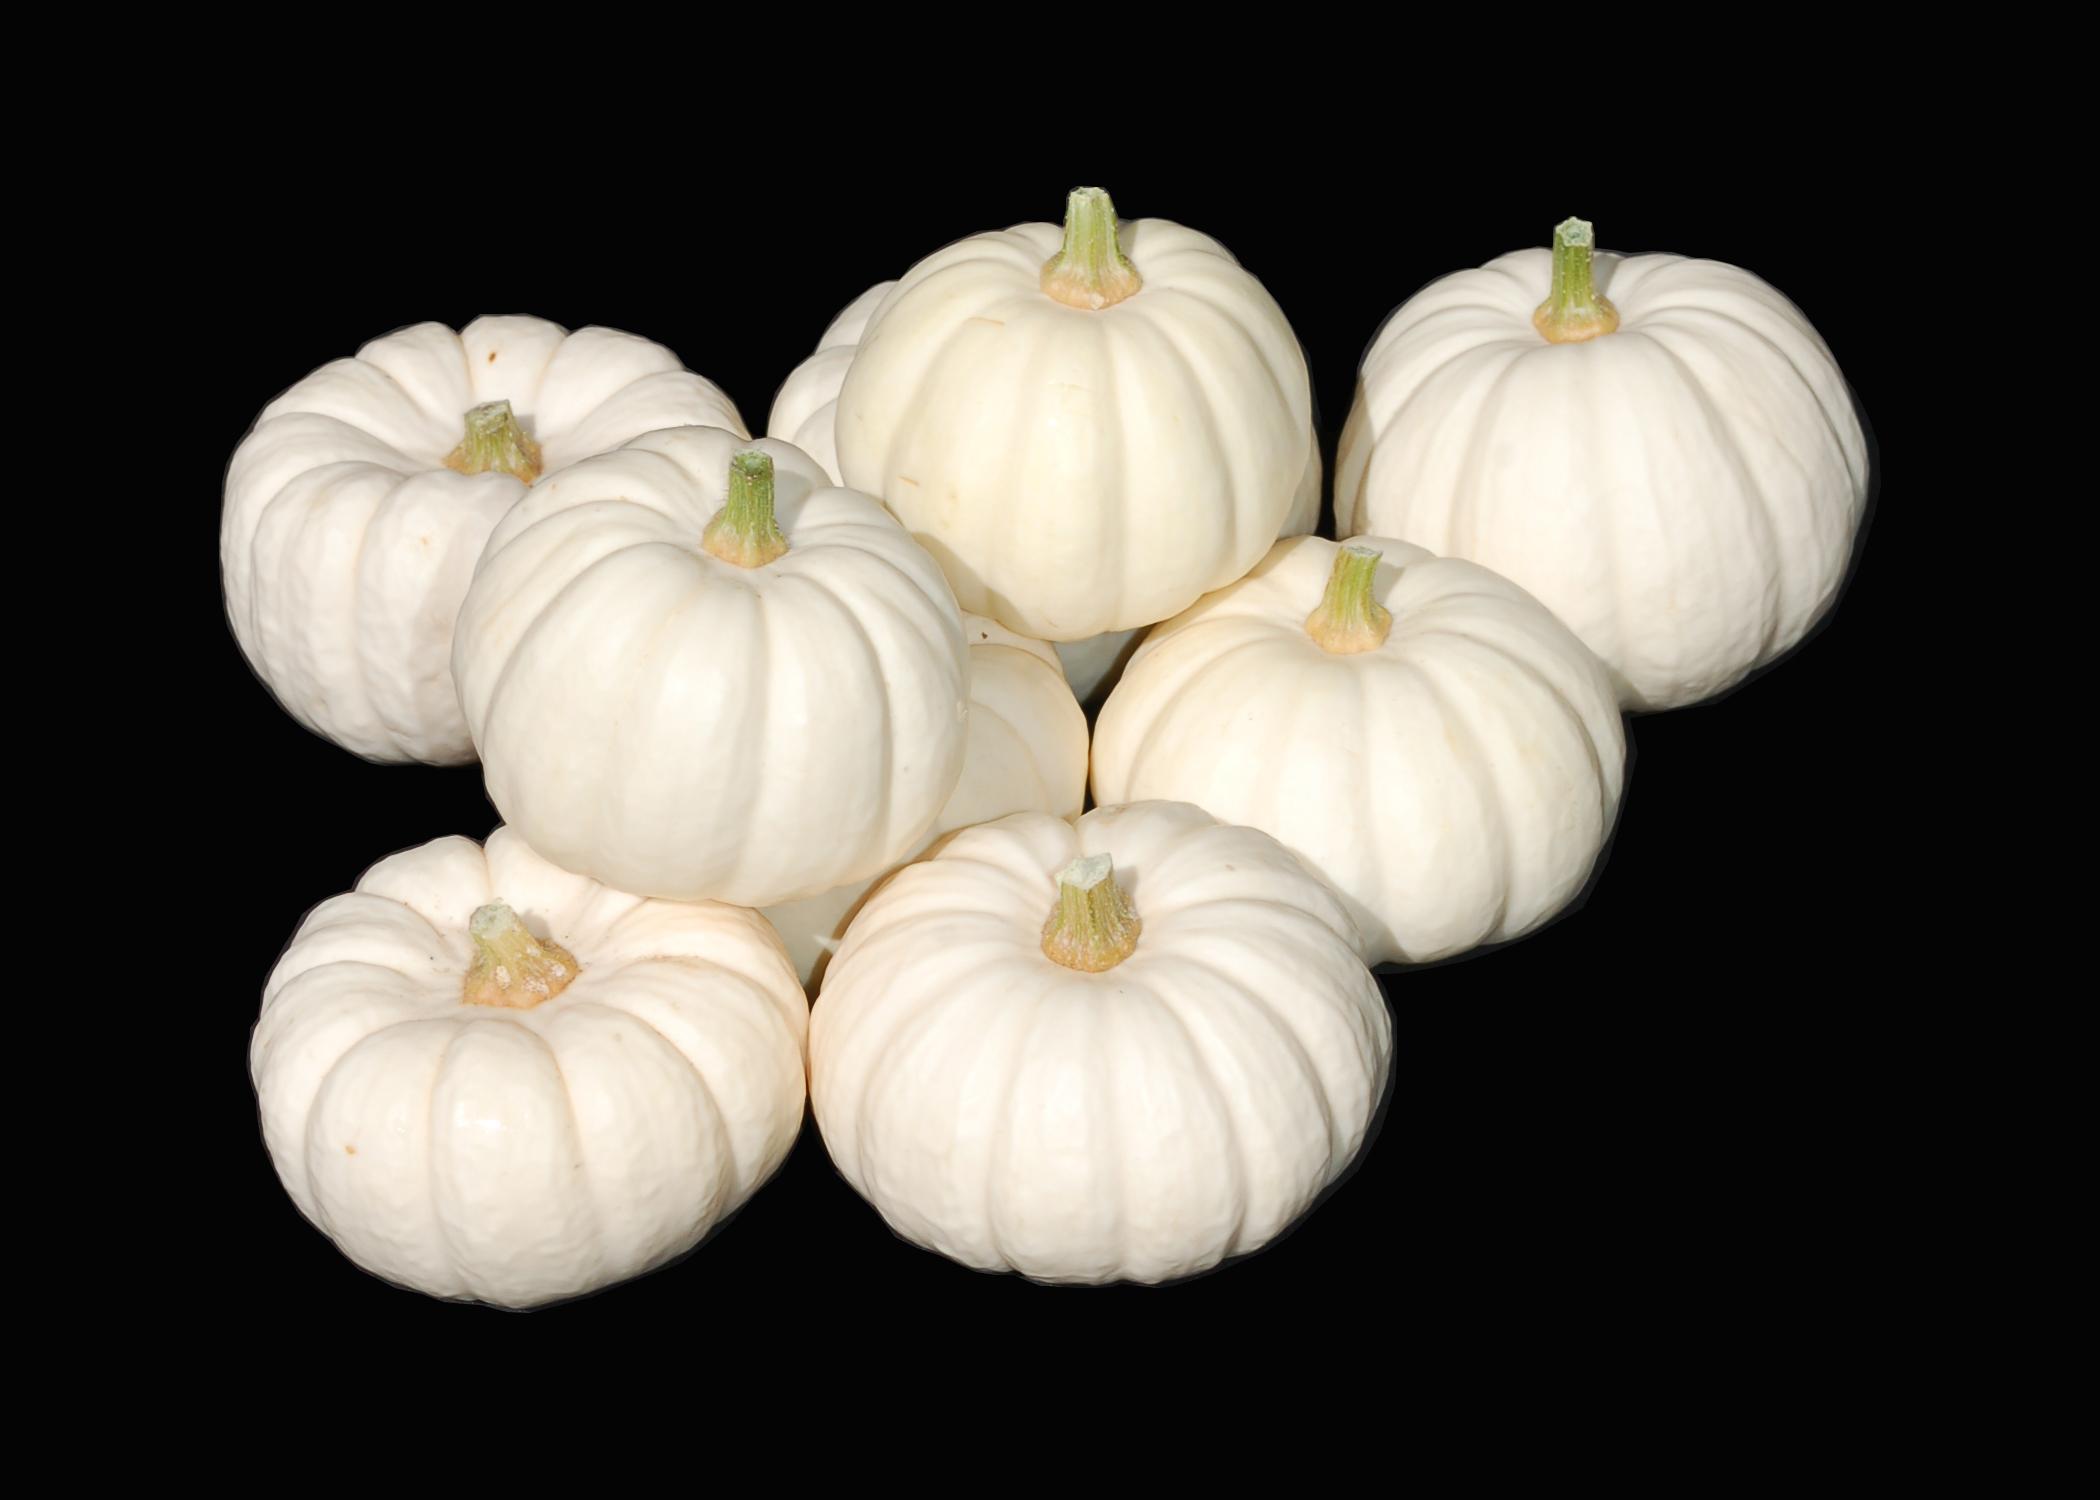 Baby Boo – Autumn Harvest Pumpkins